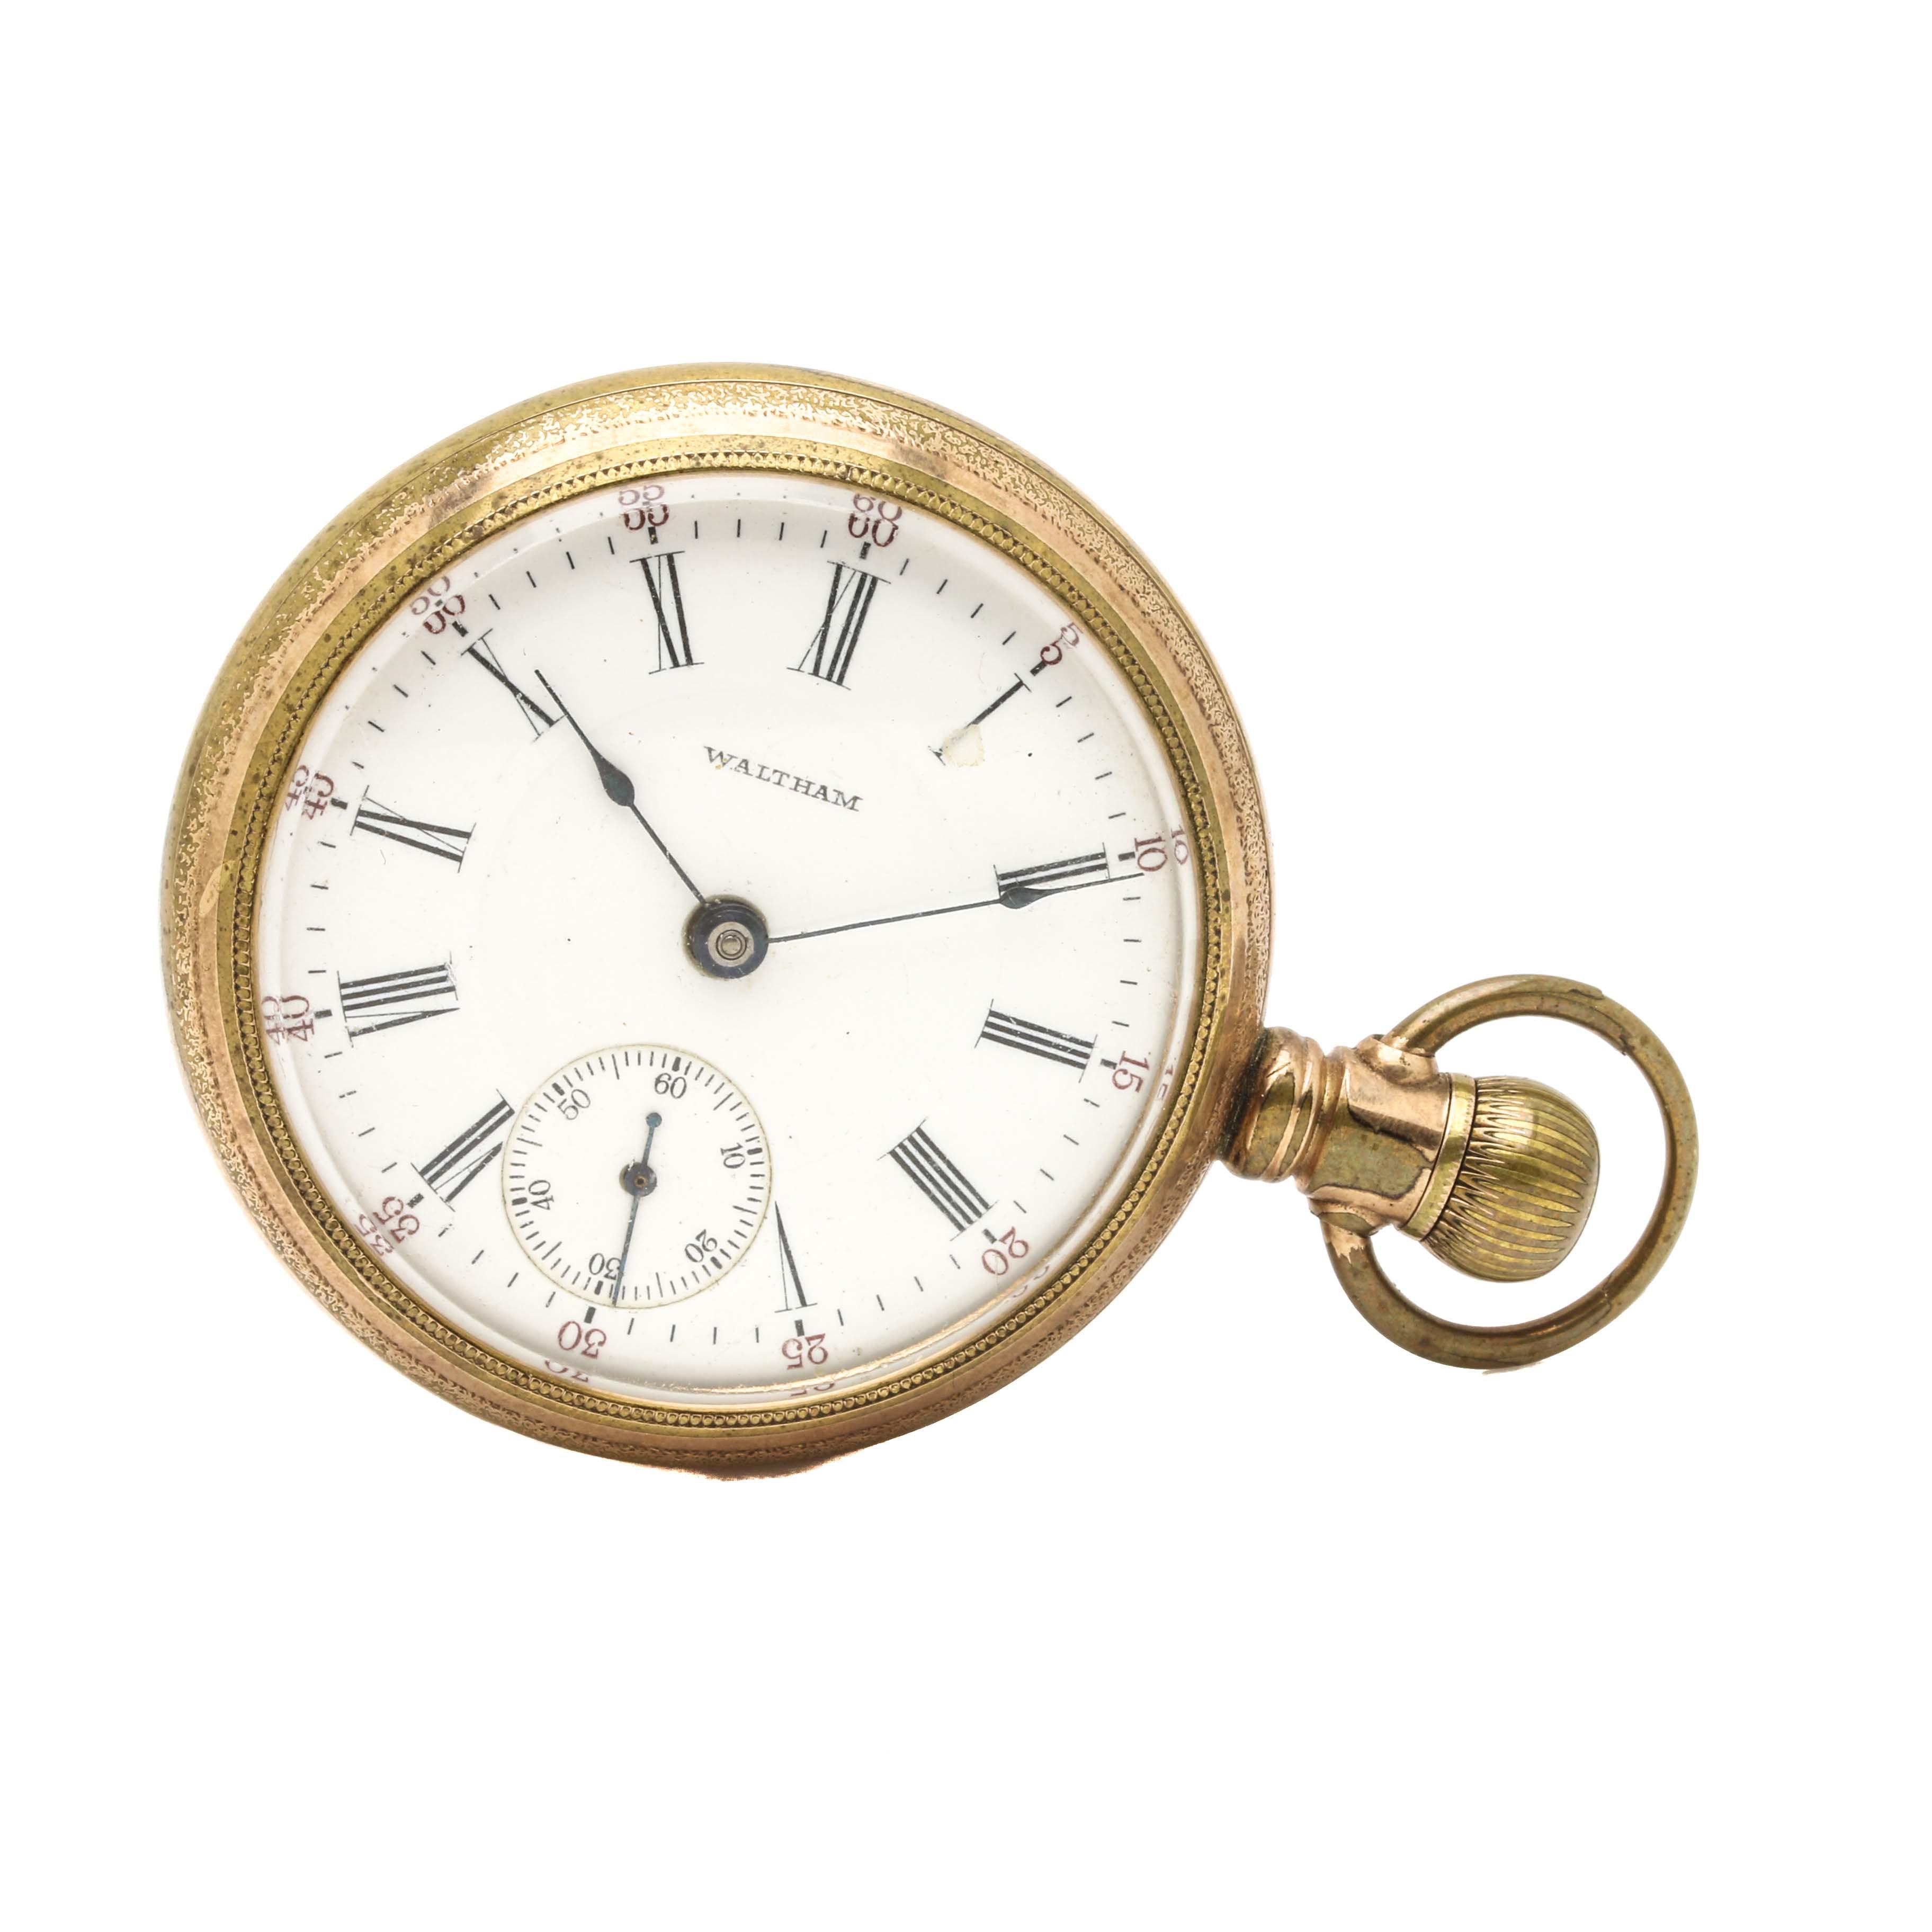 Circa 1907 Waltham Sidewinder Open-Face Pocket Watch